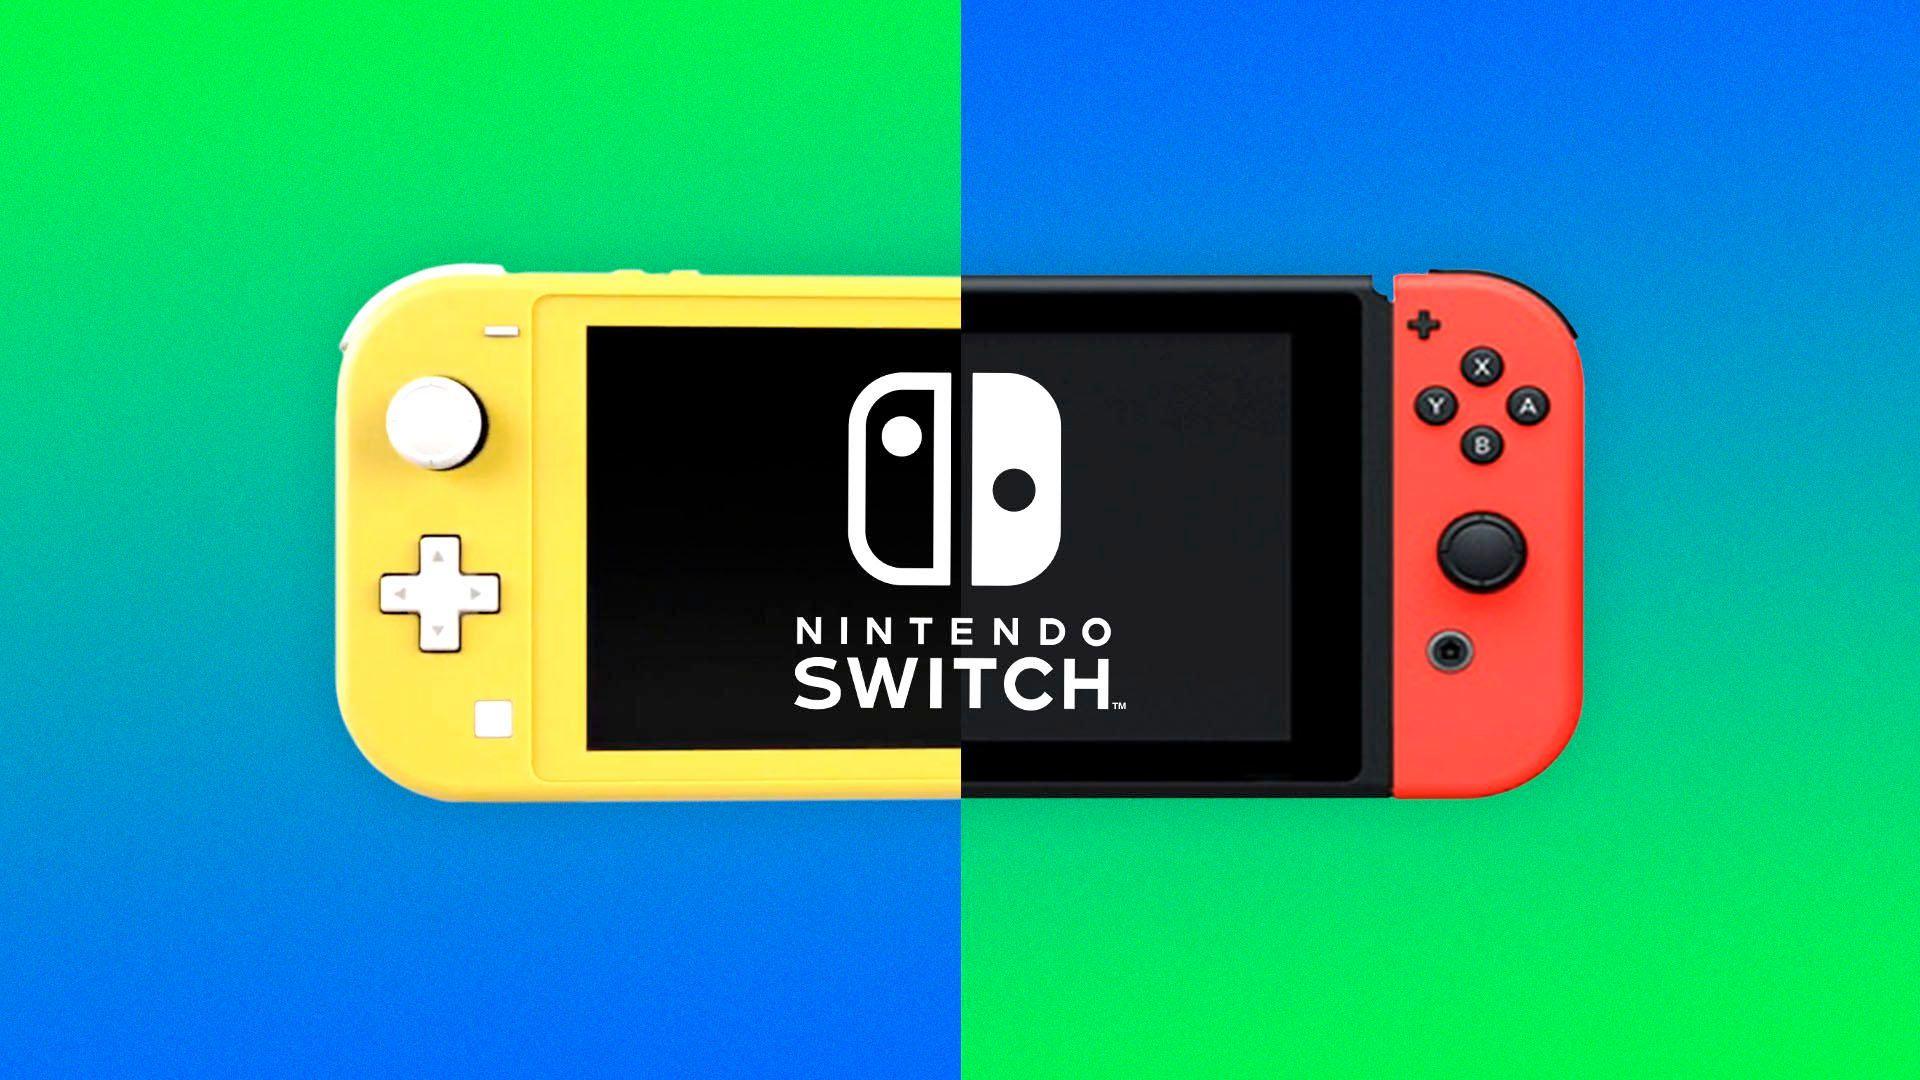 Köp Nintendo Switch 2019 och Switch Lite billigt